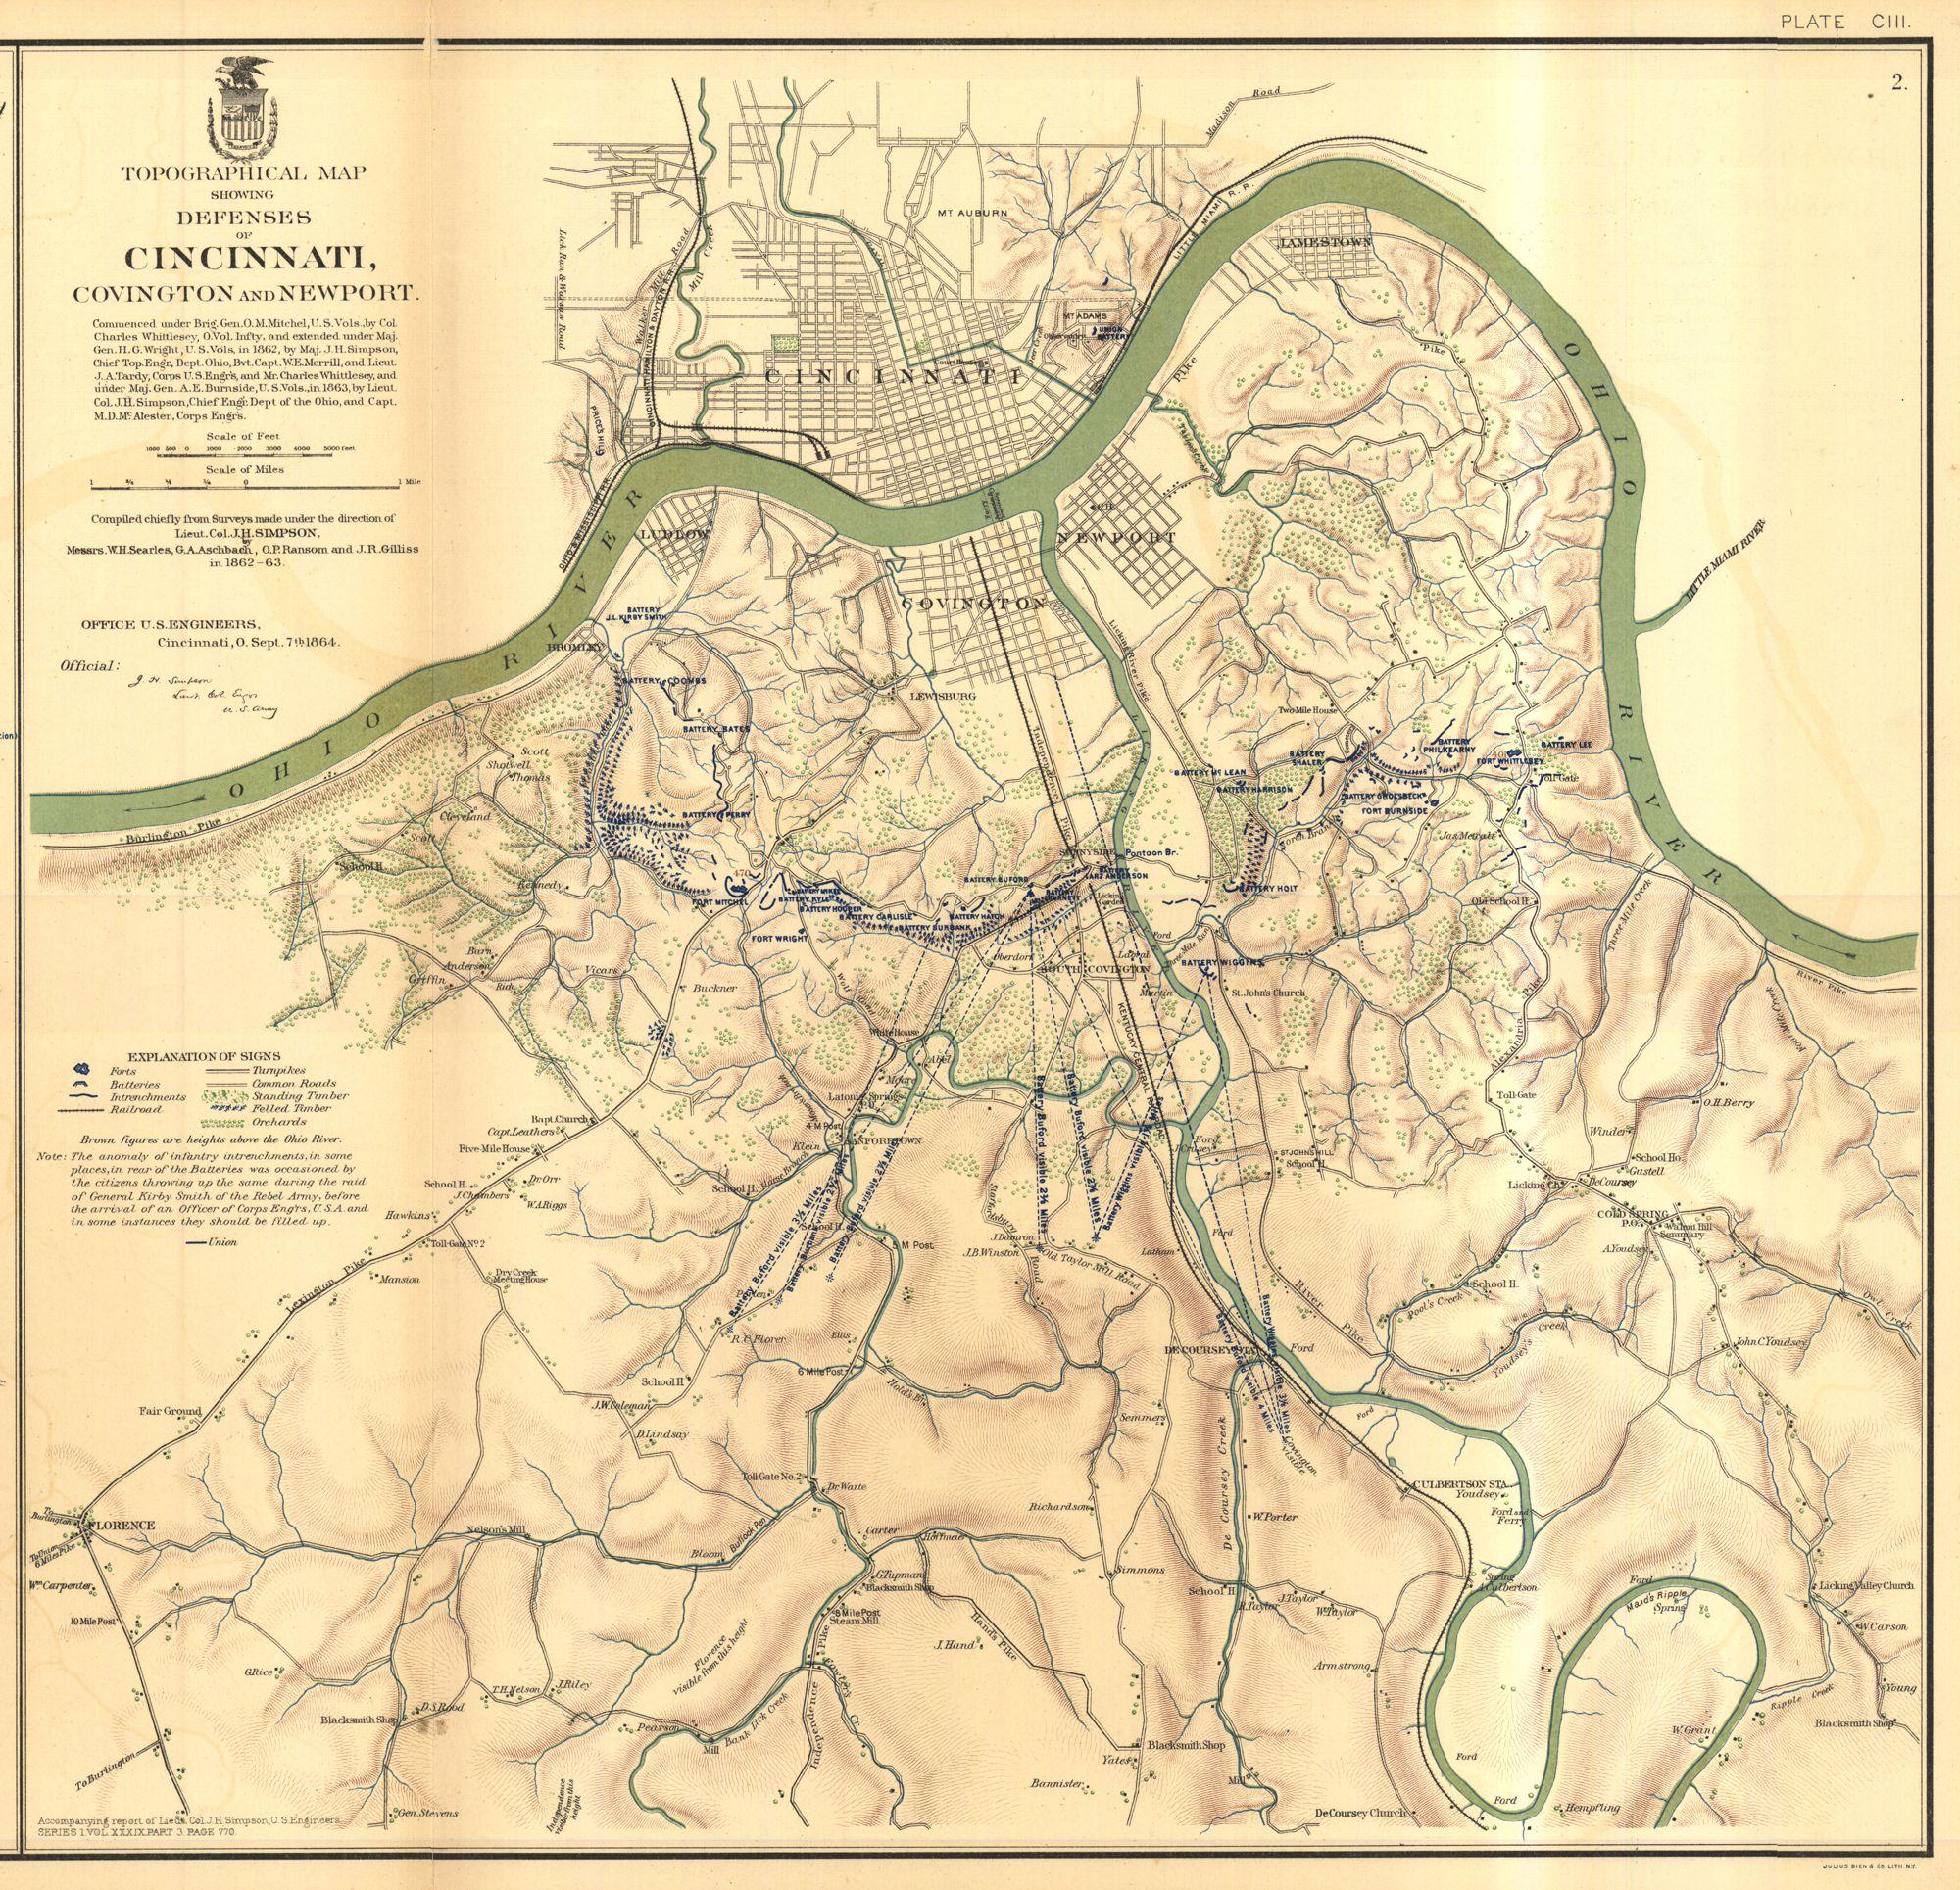 Civil War Map on